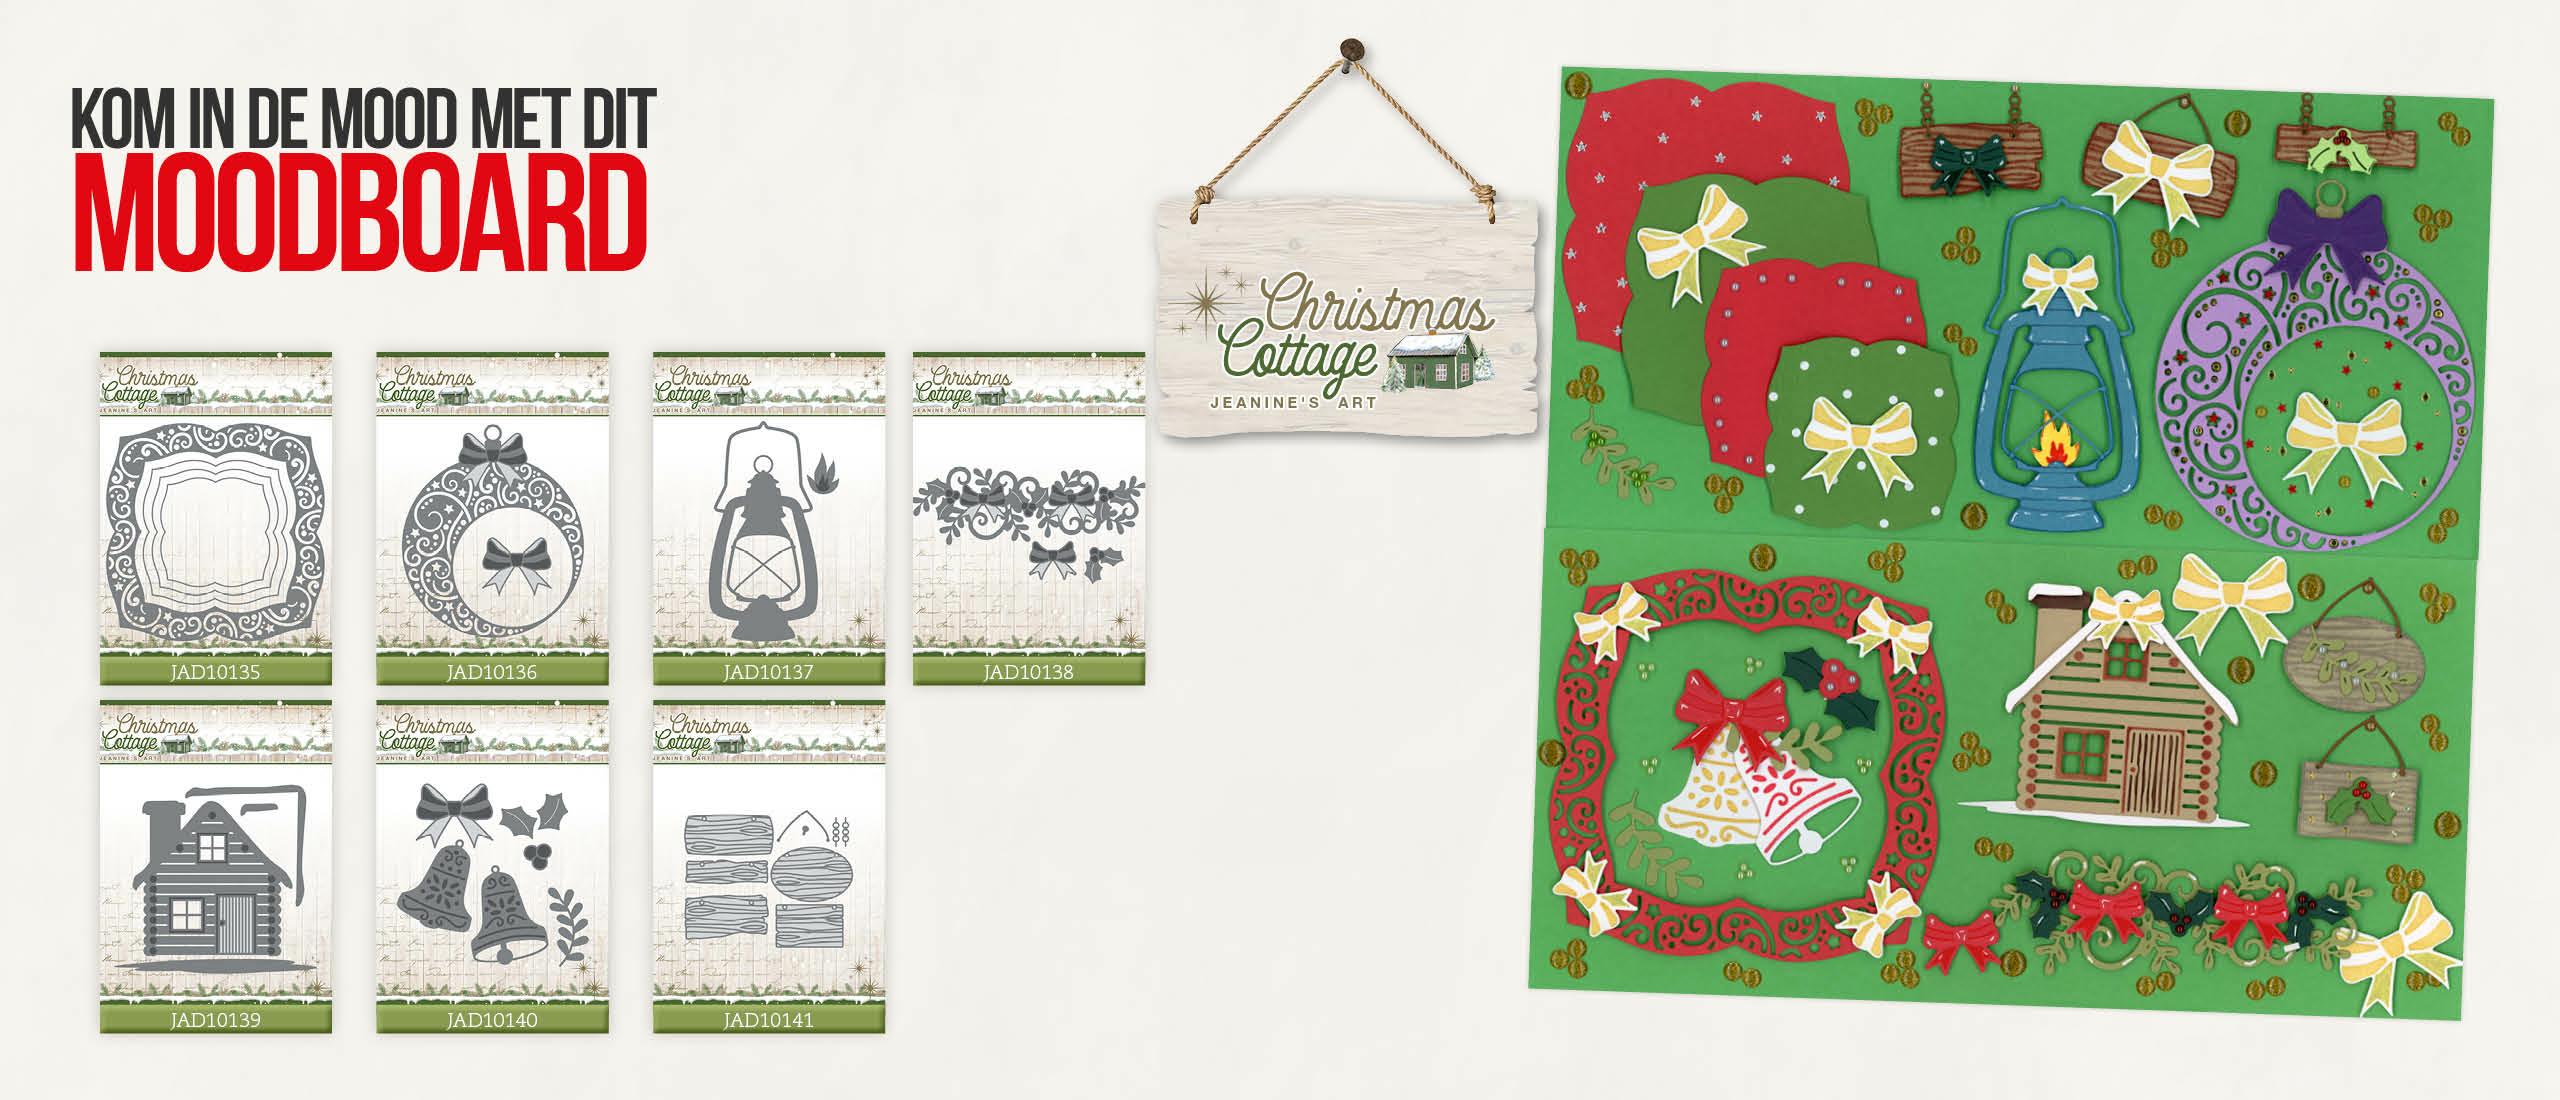 Metamorfosetijd: Moodboard Christmas Cottage - Jeanine's Art 🎄🏚